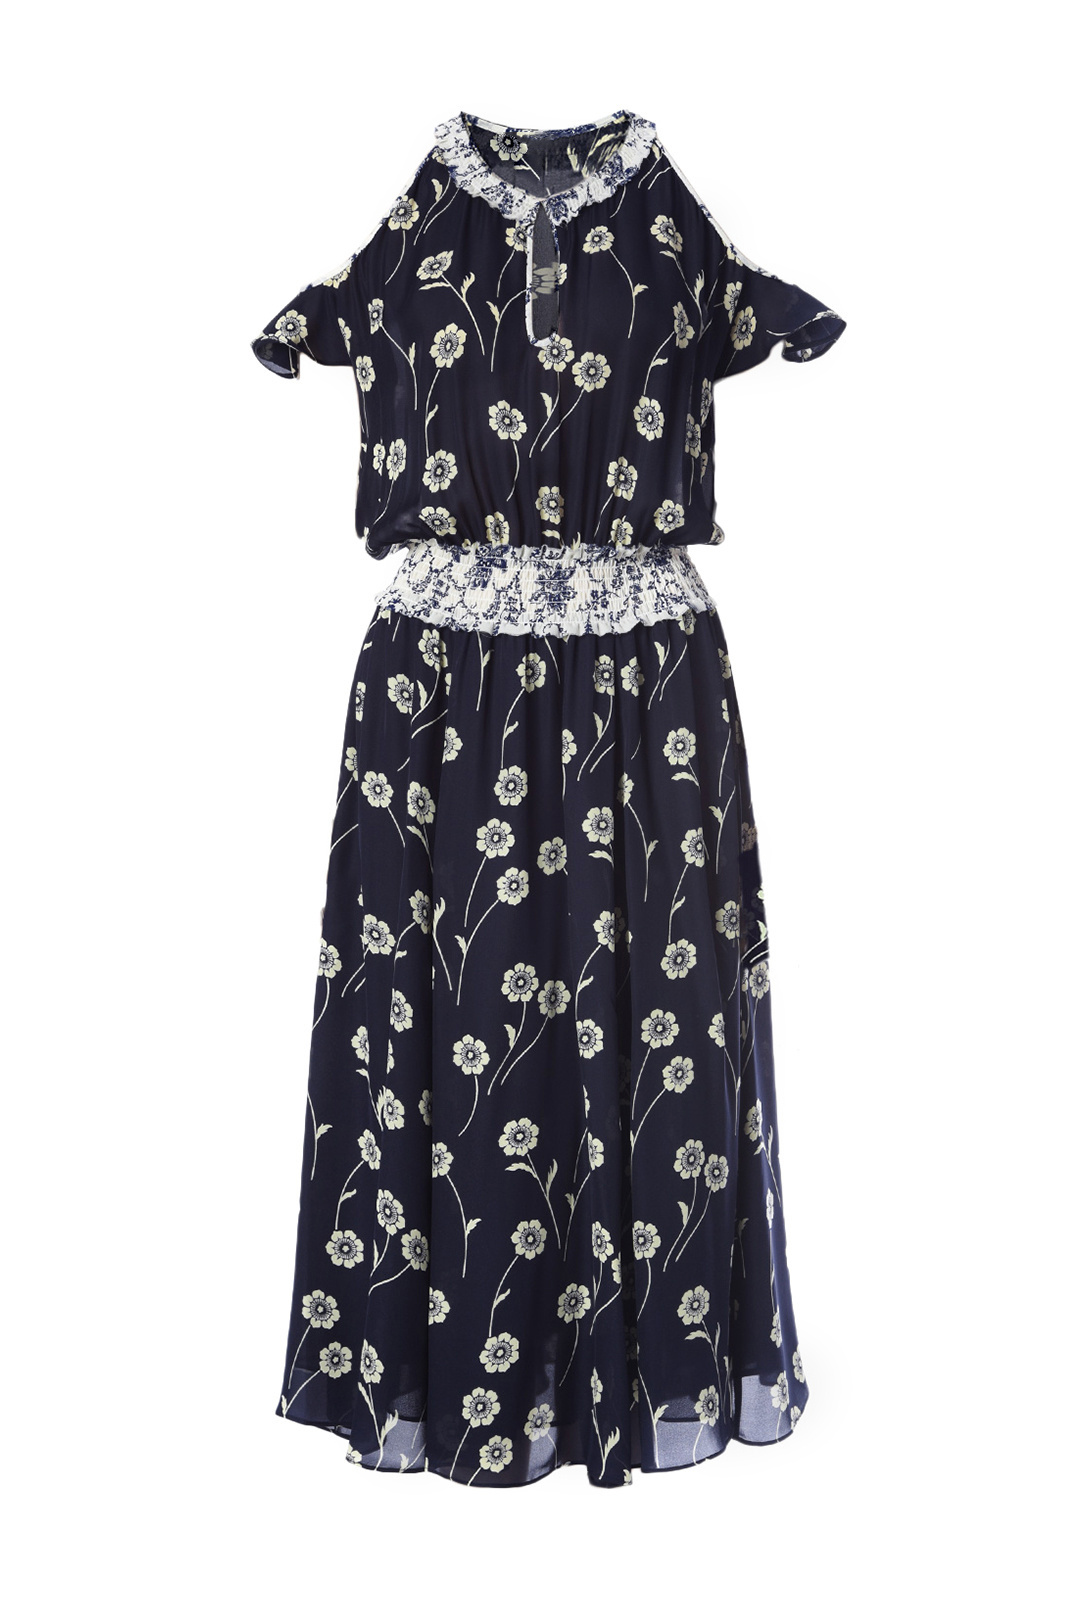 Derek Lam 10 Crosby Midnight Dress